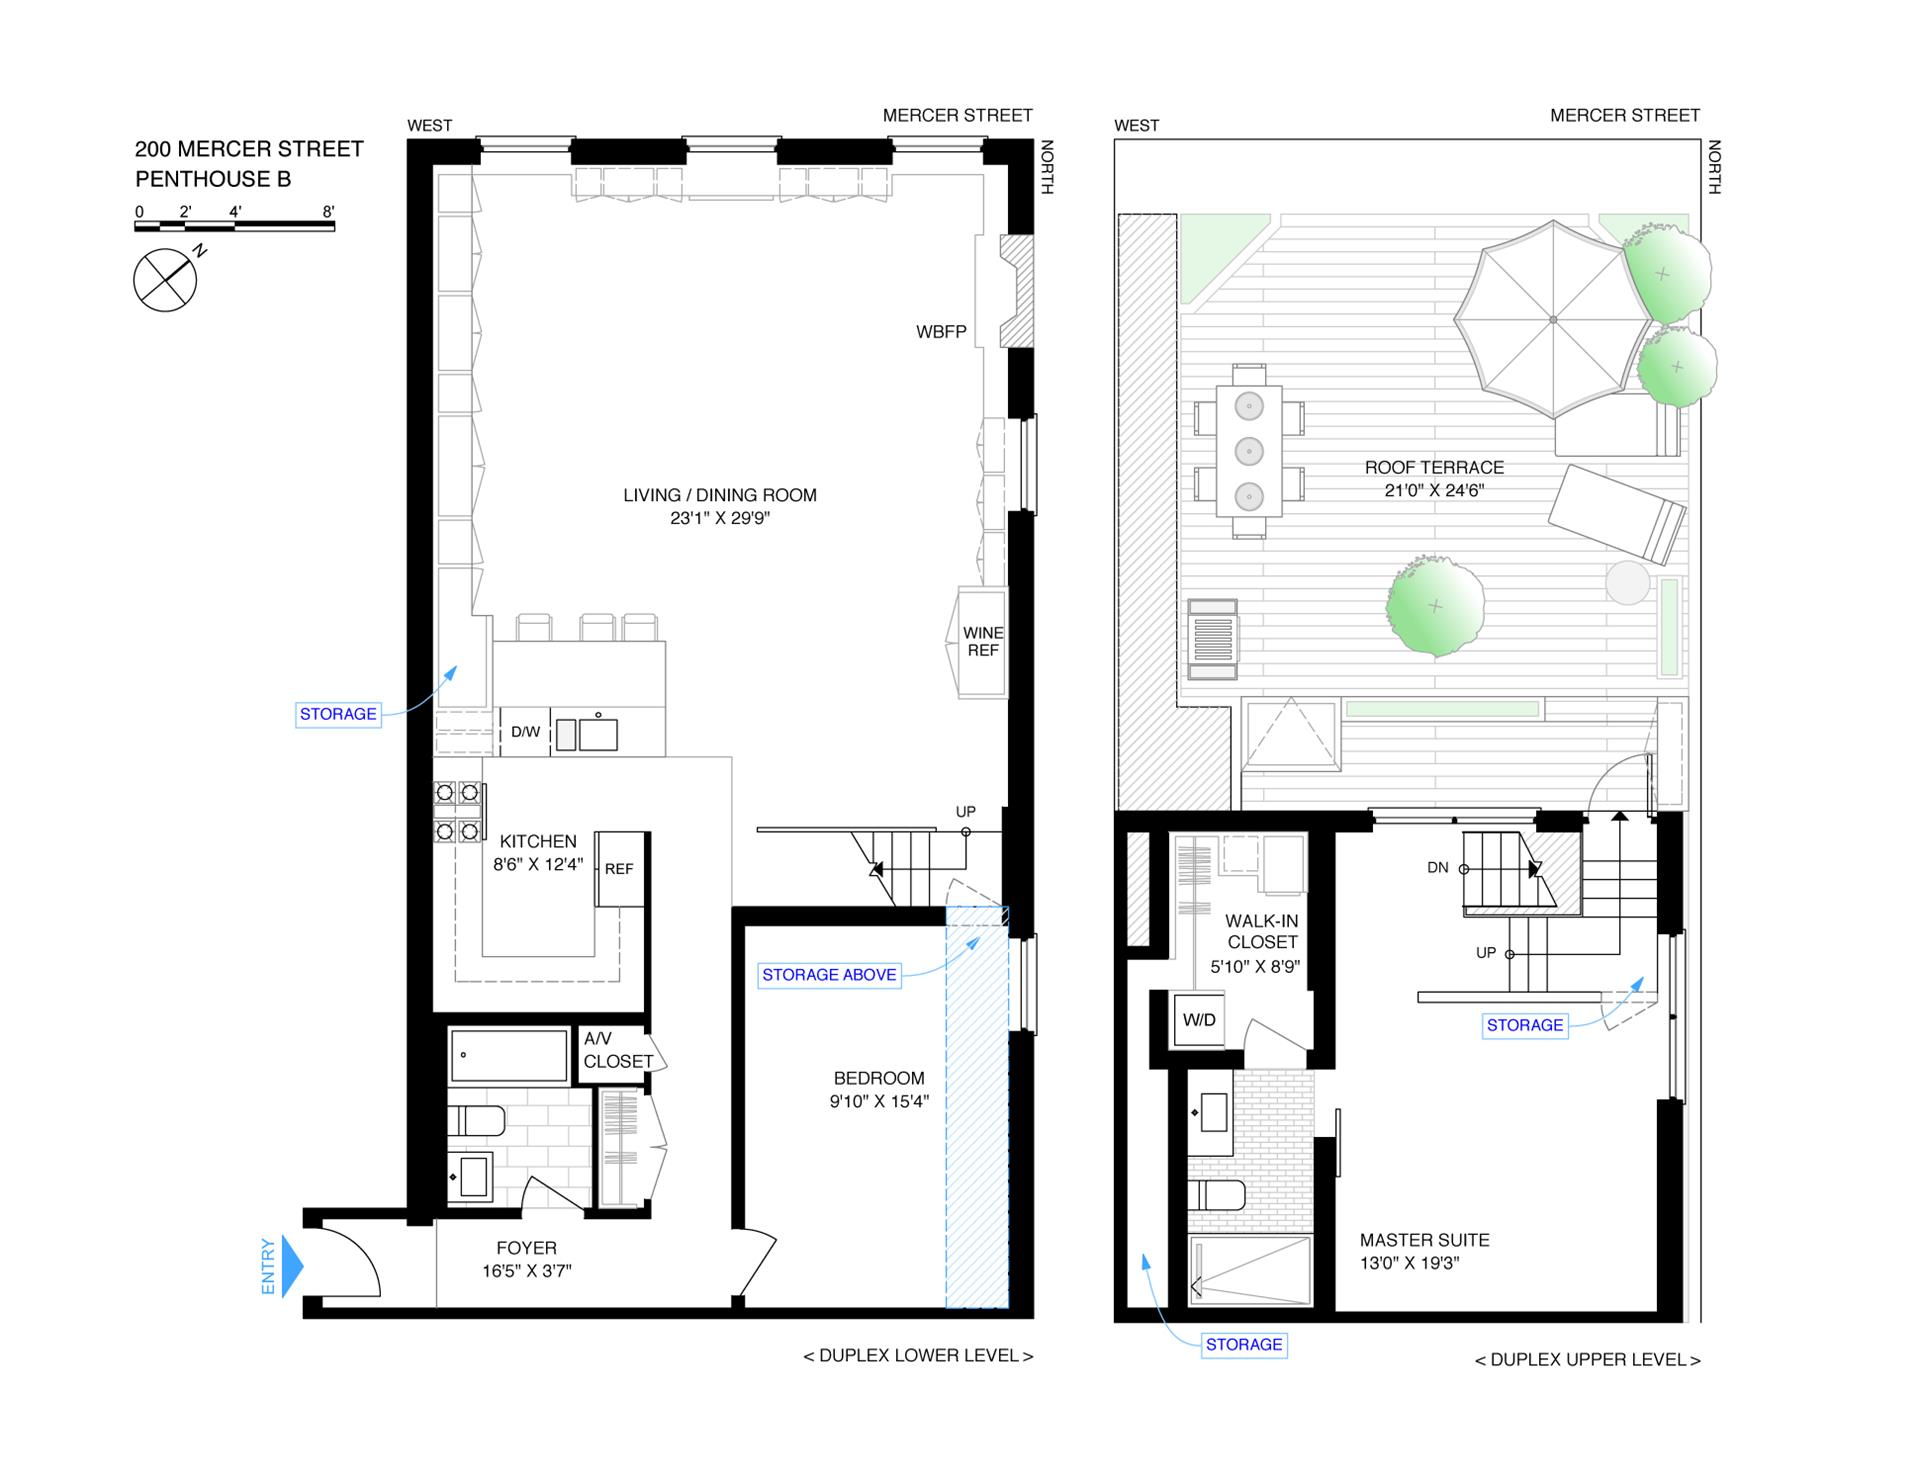 Floor plan of 200 Mercer St, 4B - Greenwich Village, New York